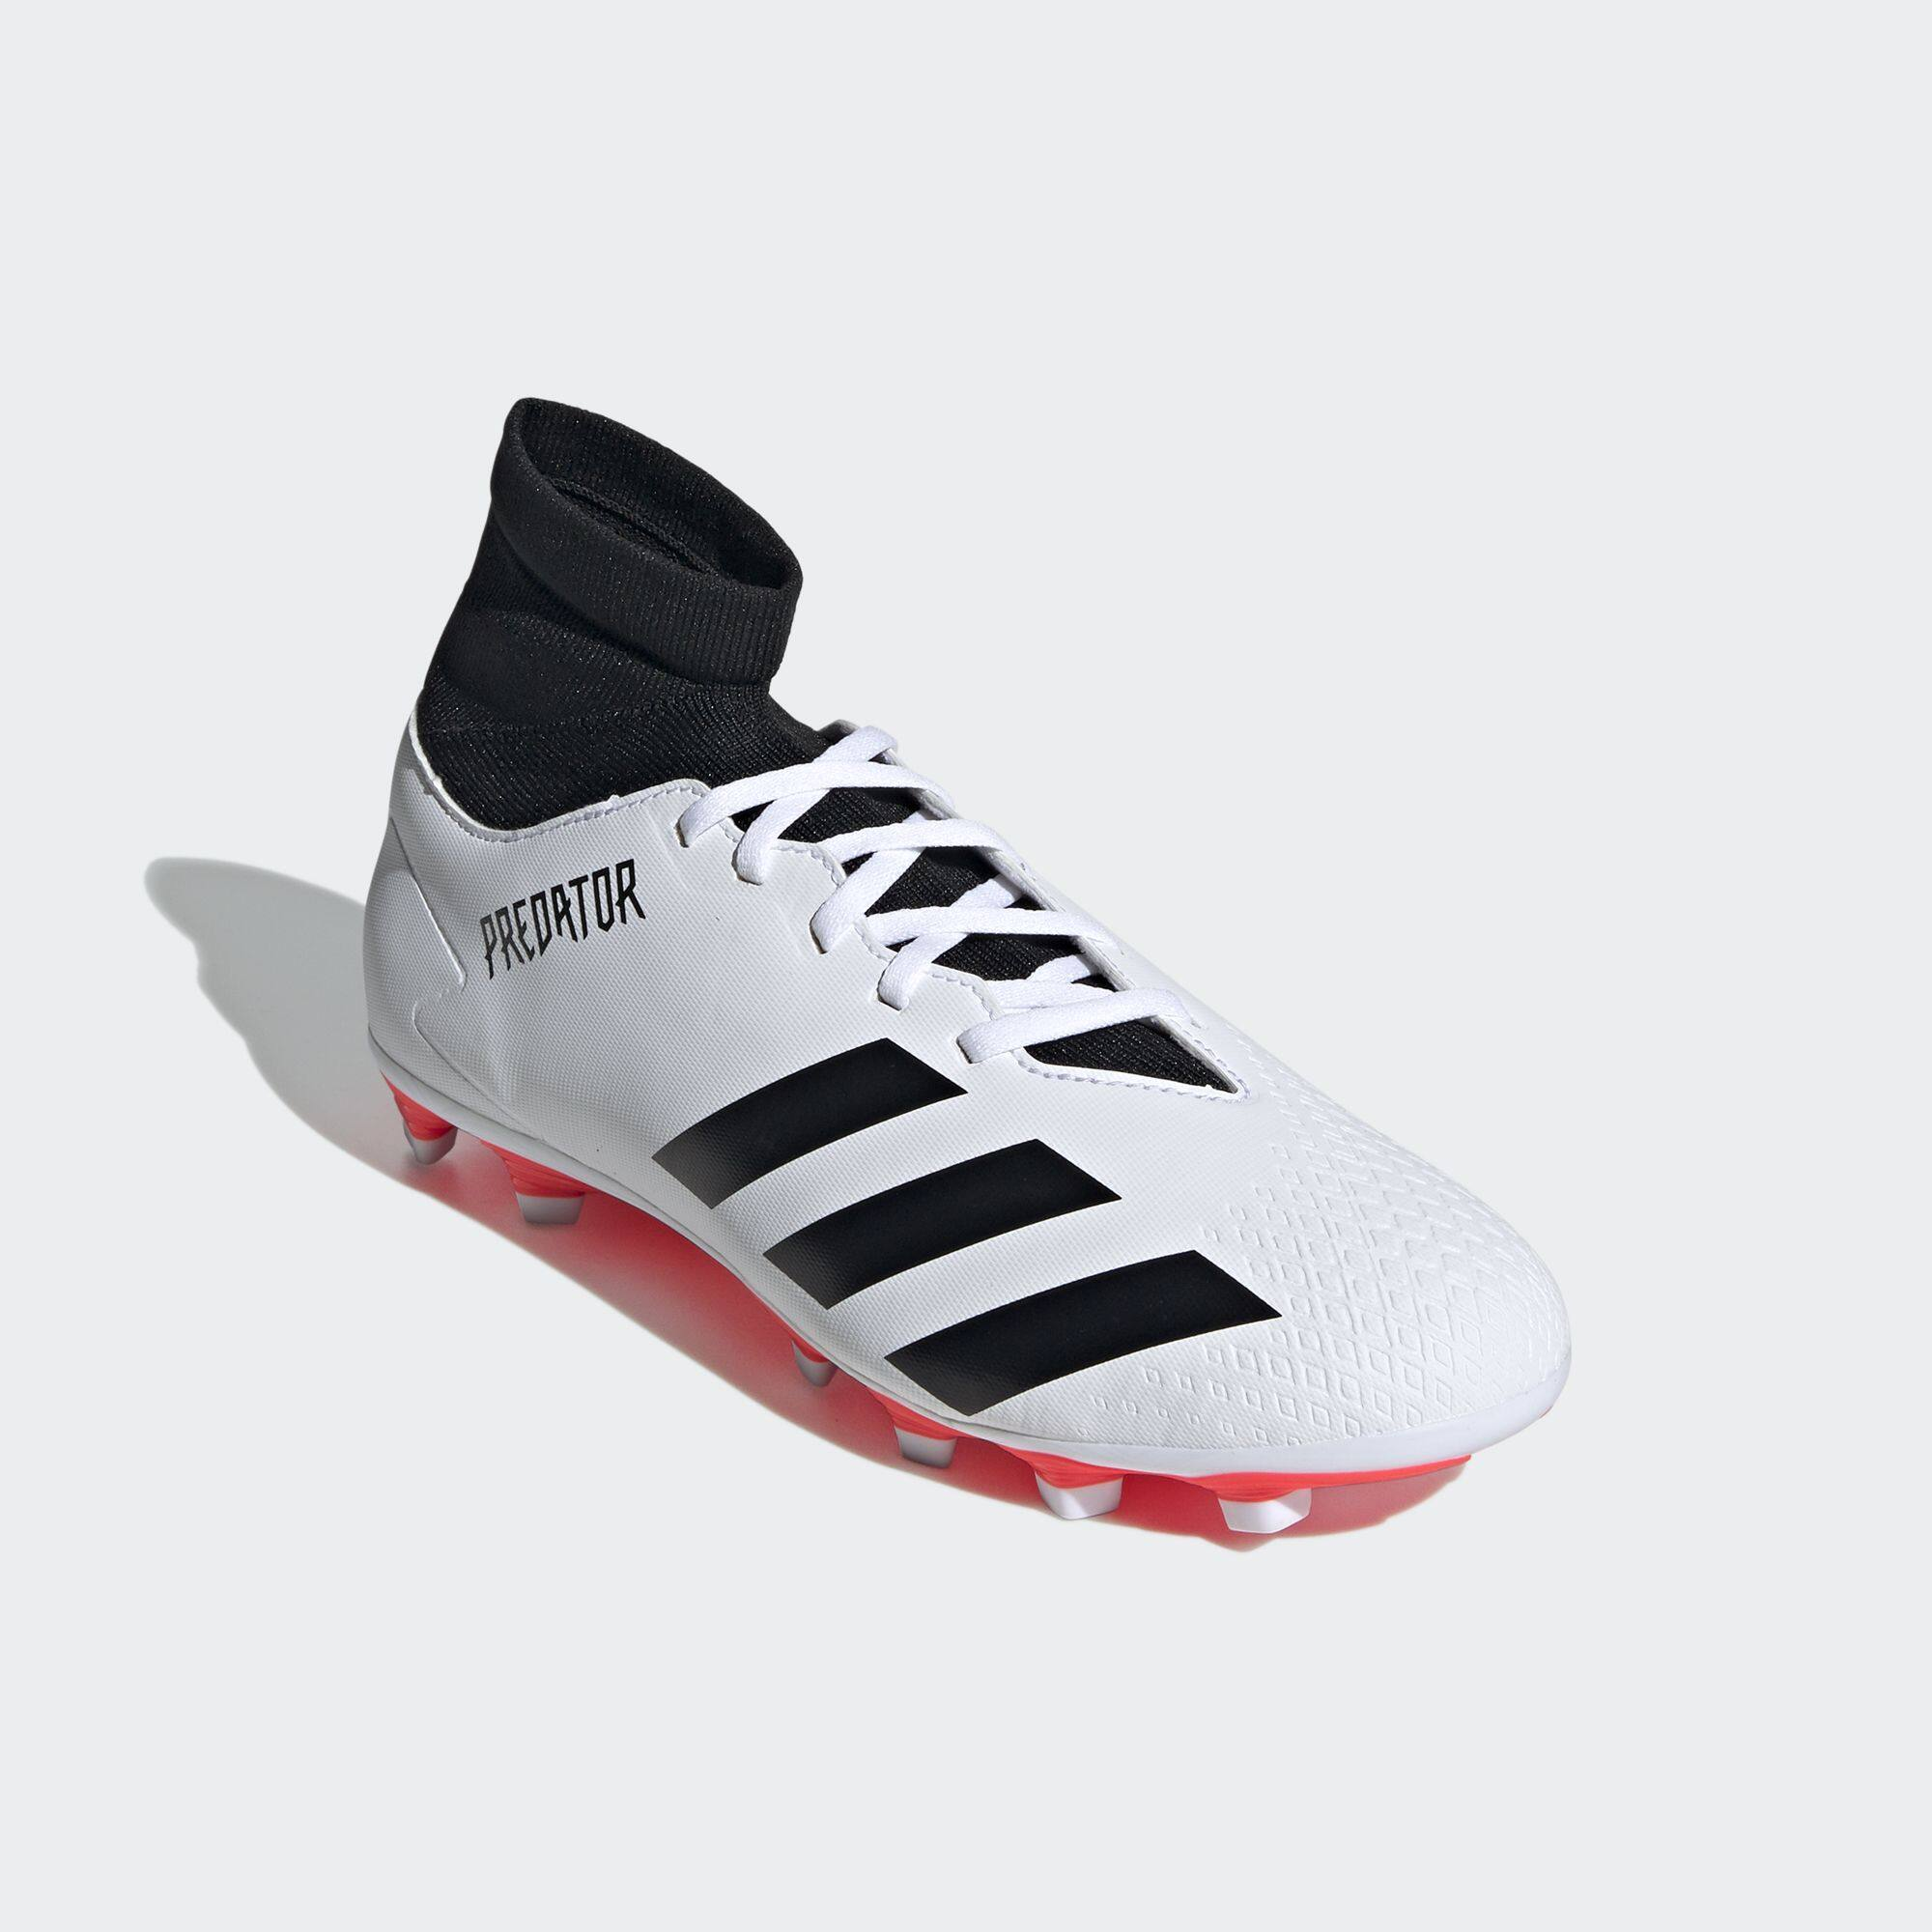 adidas FOOTBALL/SOCCER รองเท้าฟุตบอล Predator 20.4 Flexible Ground ผู้ชาย  สีขาว EG0917 | Lazada.co.th